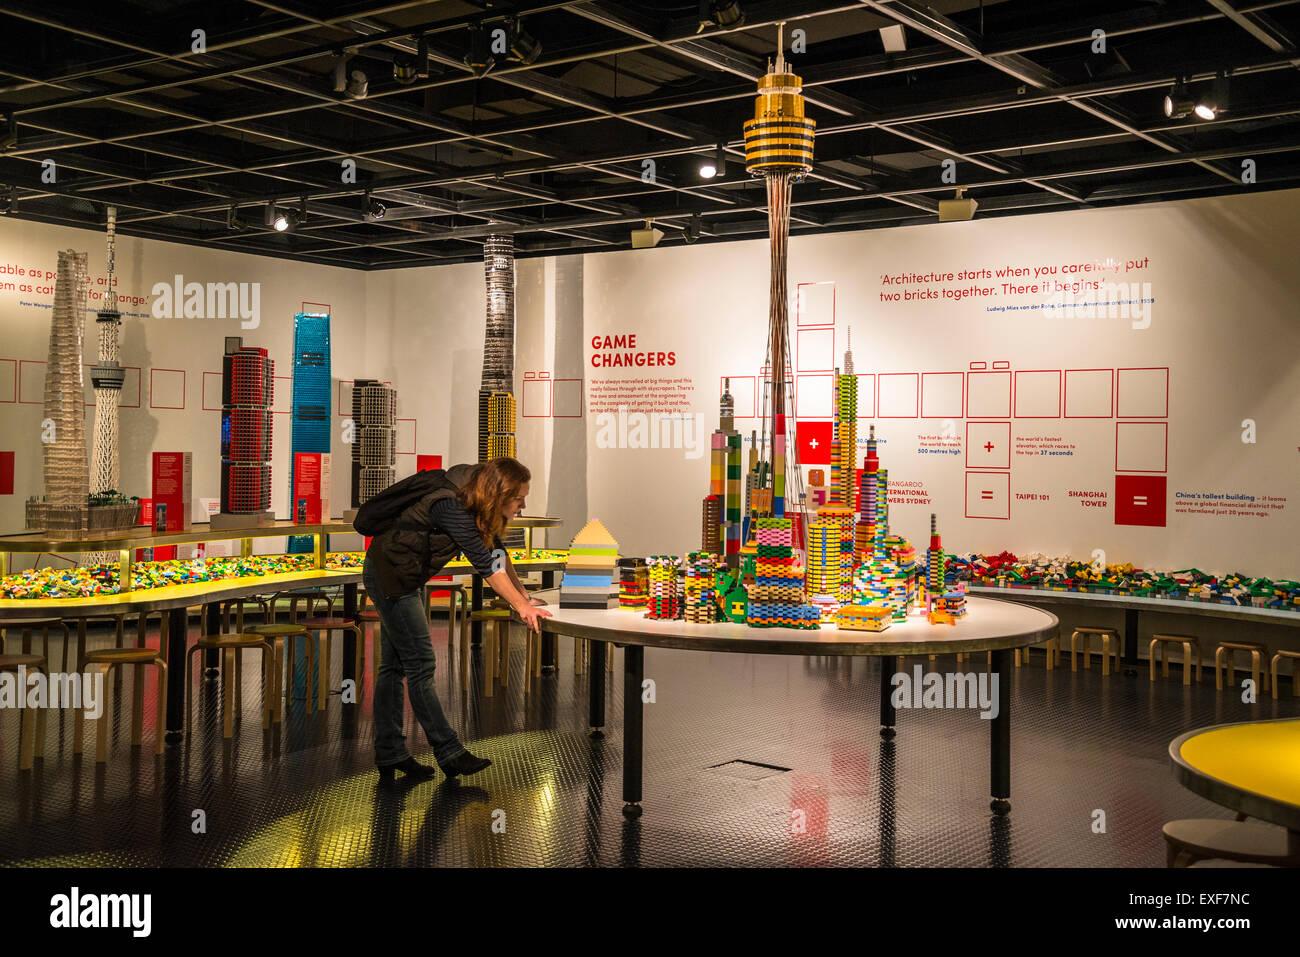 Museum of Sydney, 'Towers of Tomorrow' with LEGO Bricks exhibition, Sydney, Australia - Stock Image